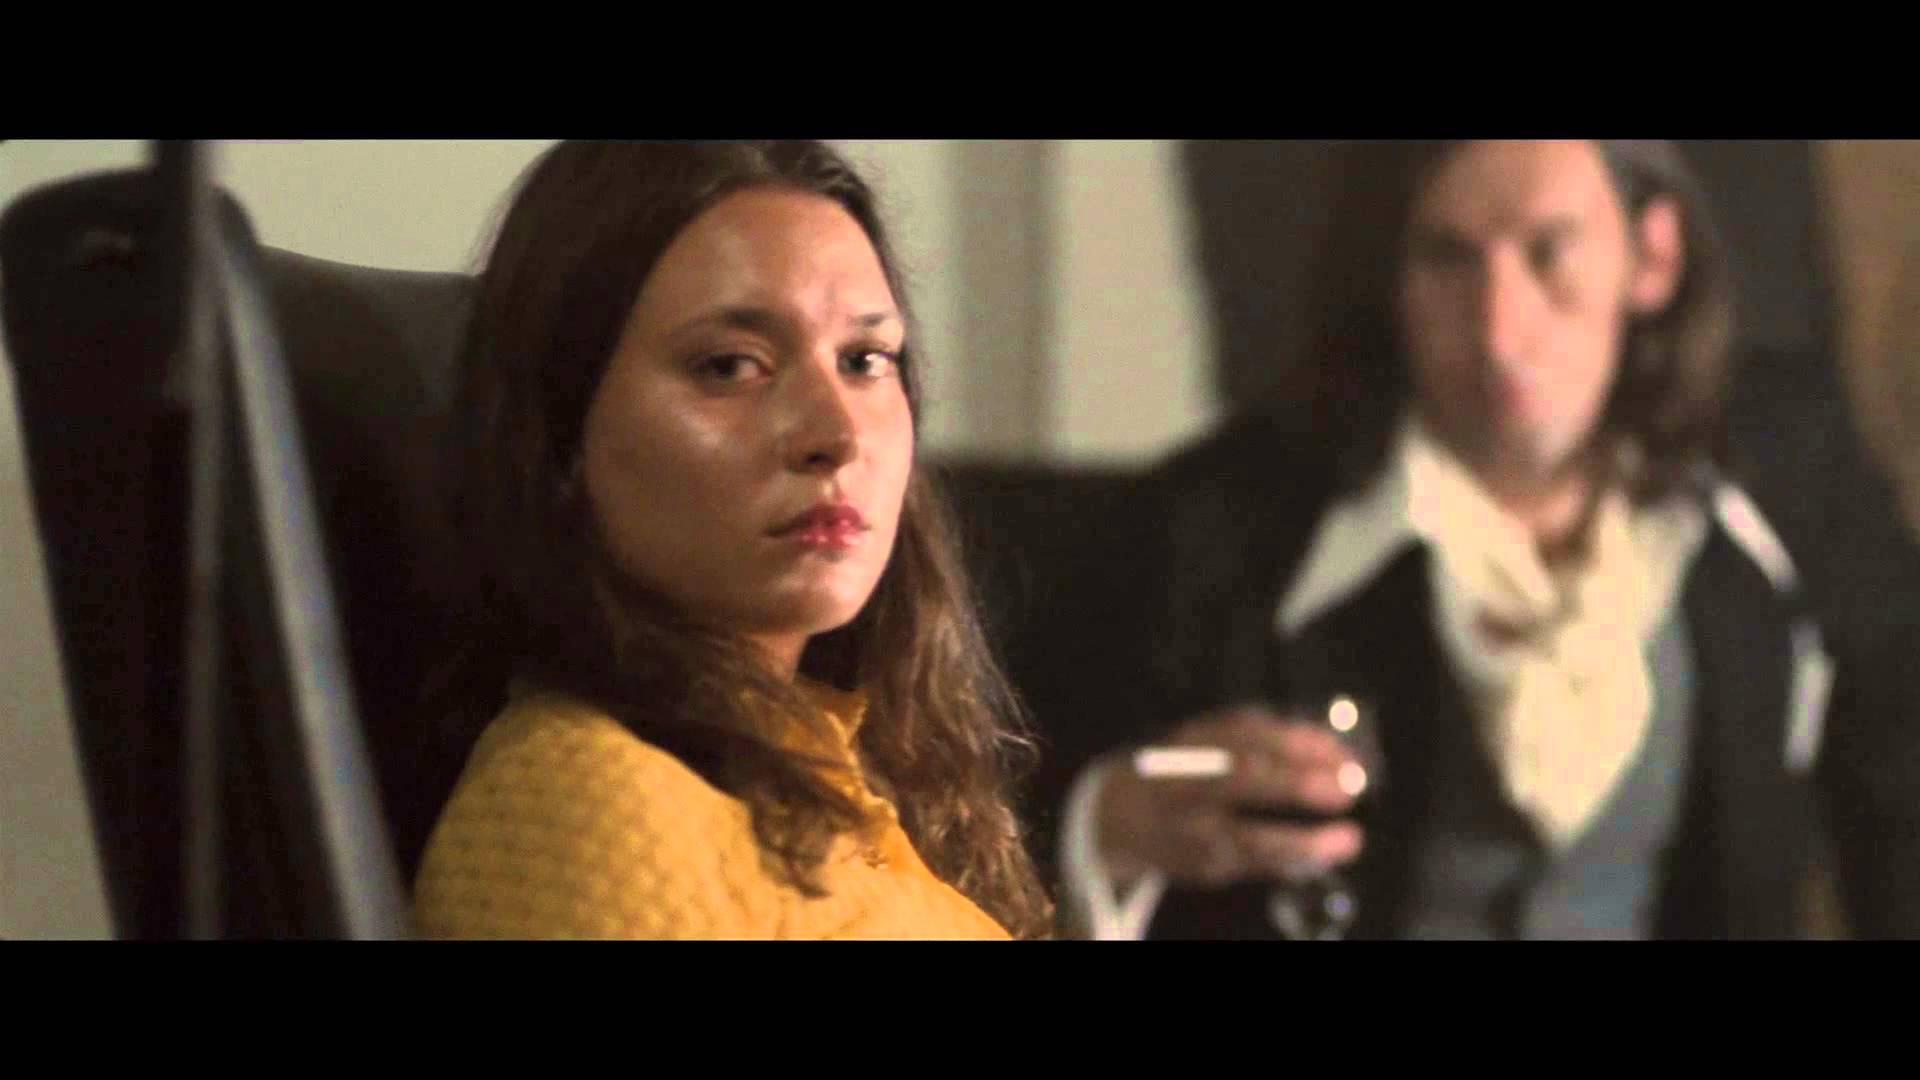 Eskort djevojka (trailer) - Call Girl